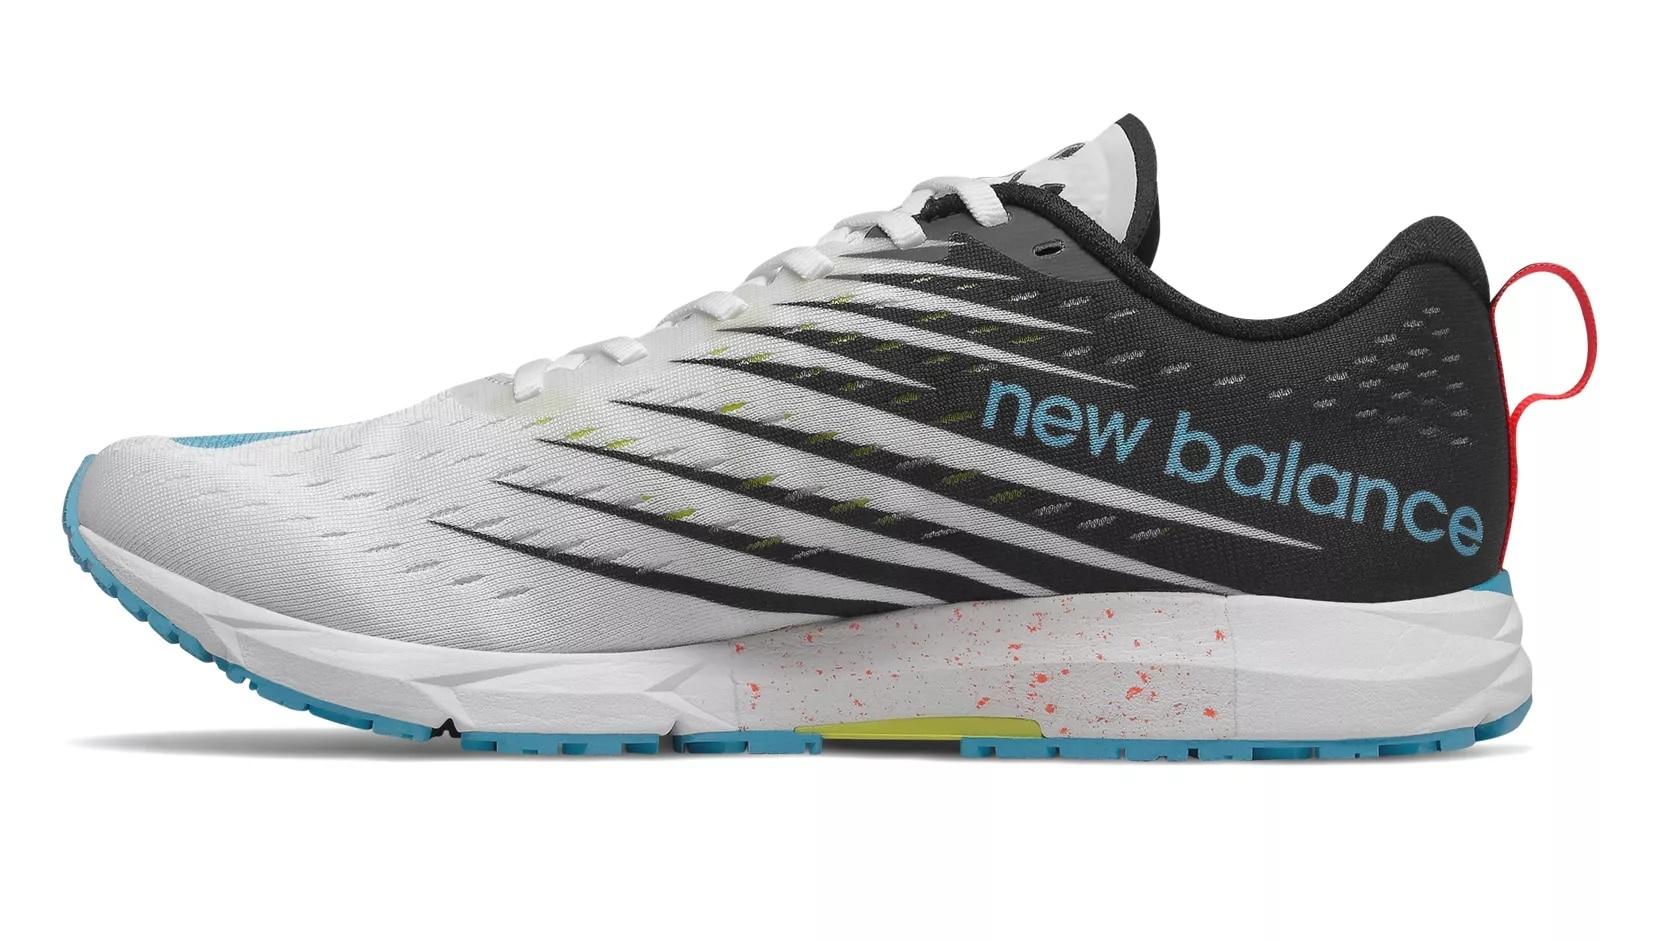 New Balance New Balance M1500v5